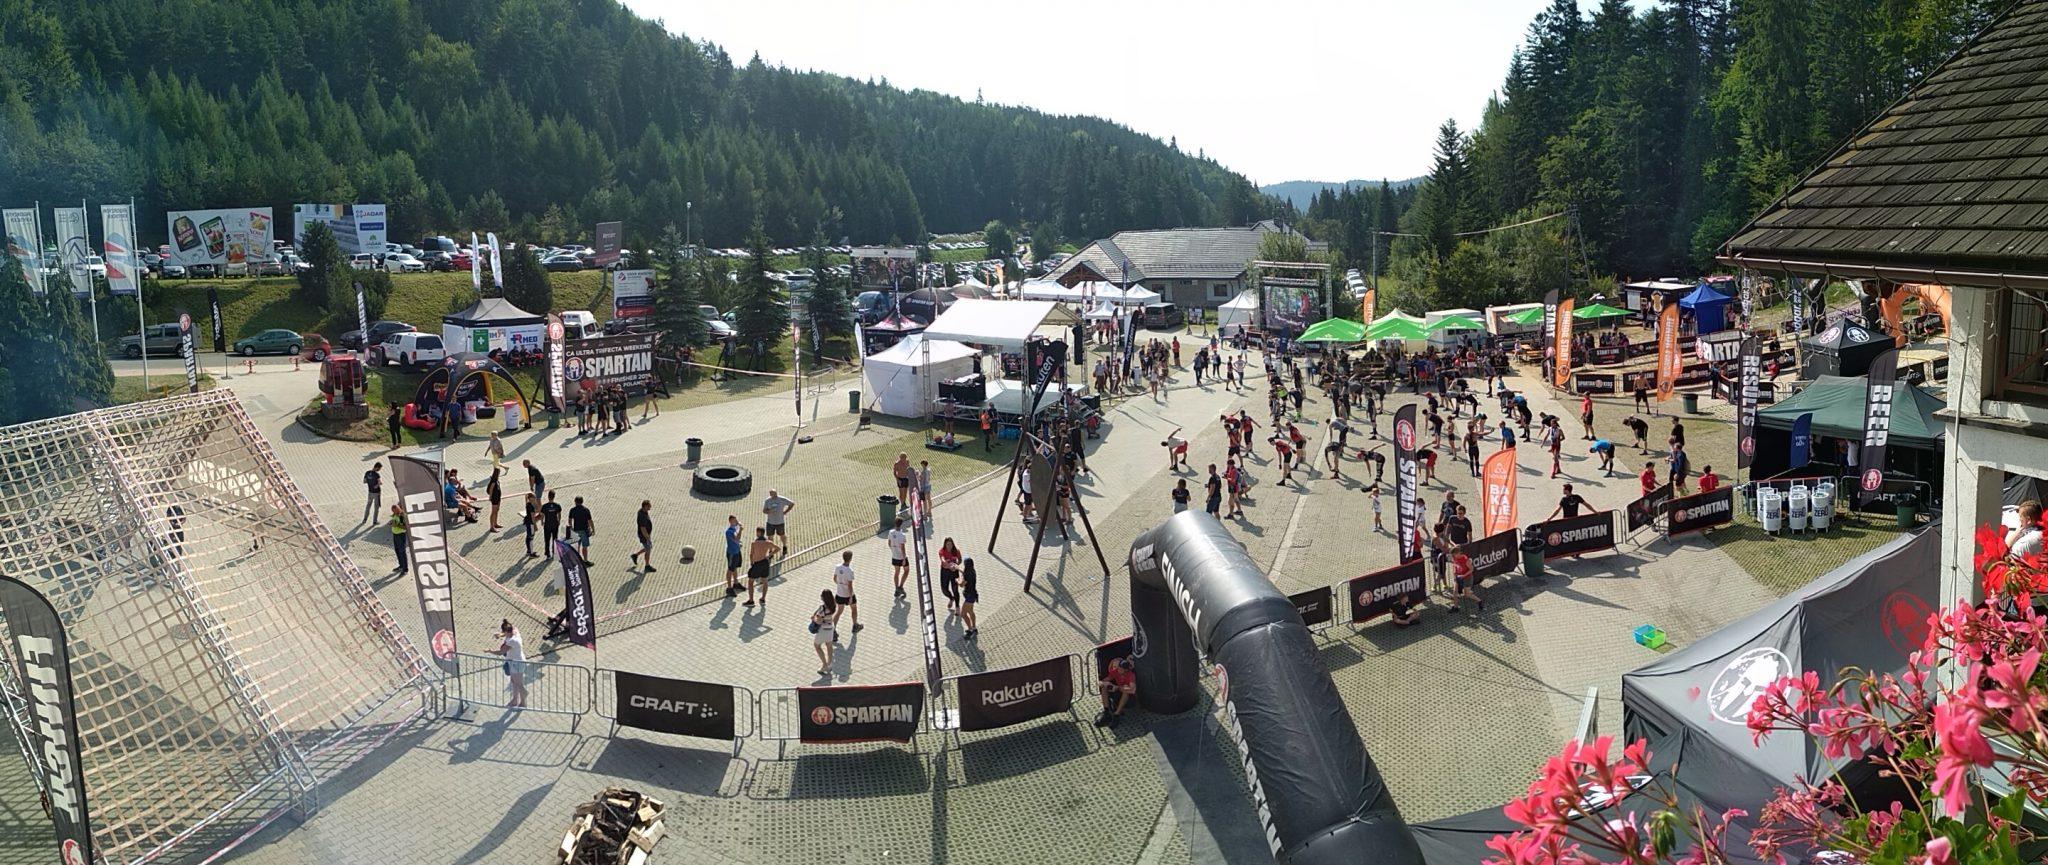 Spartan Krynica festival panoramic view